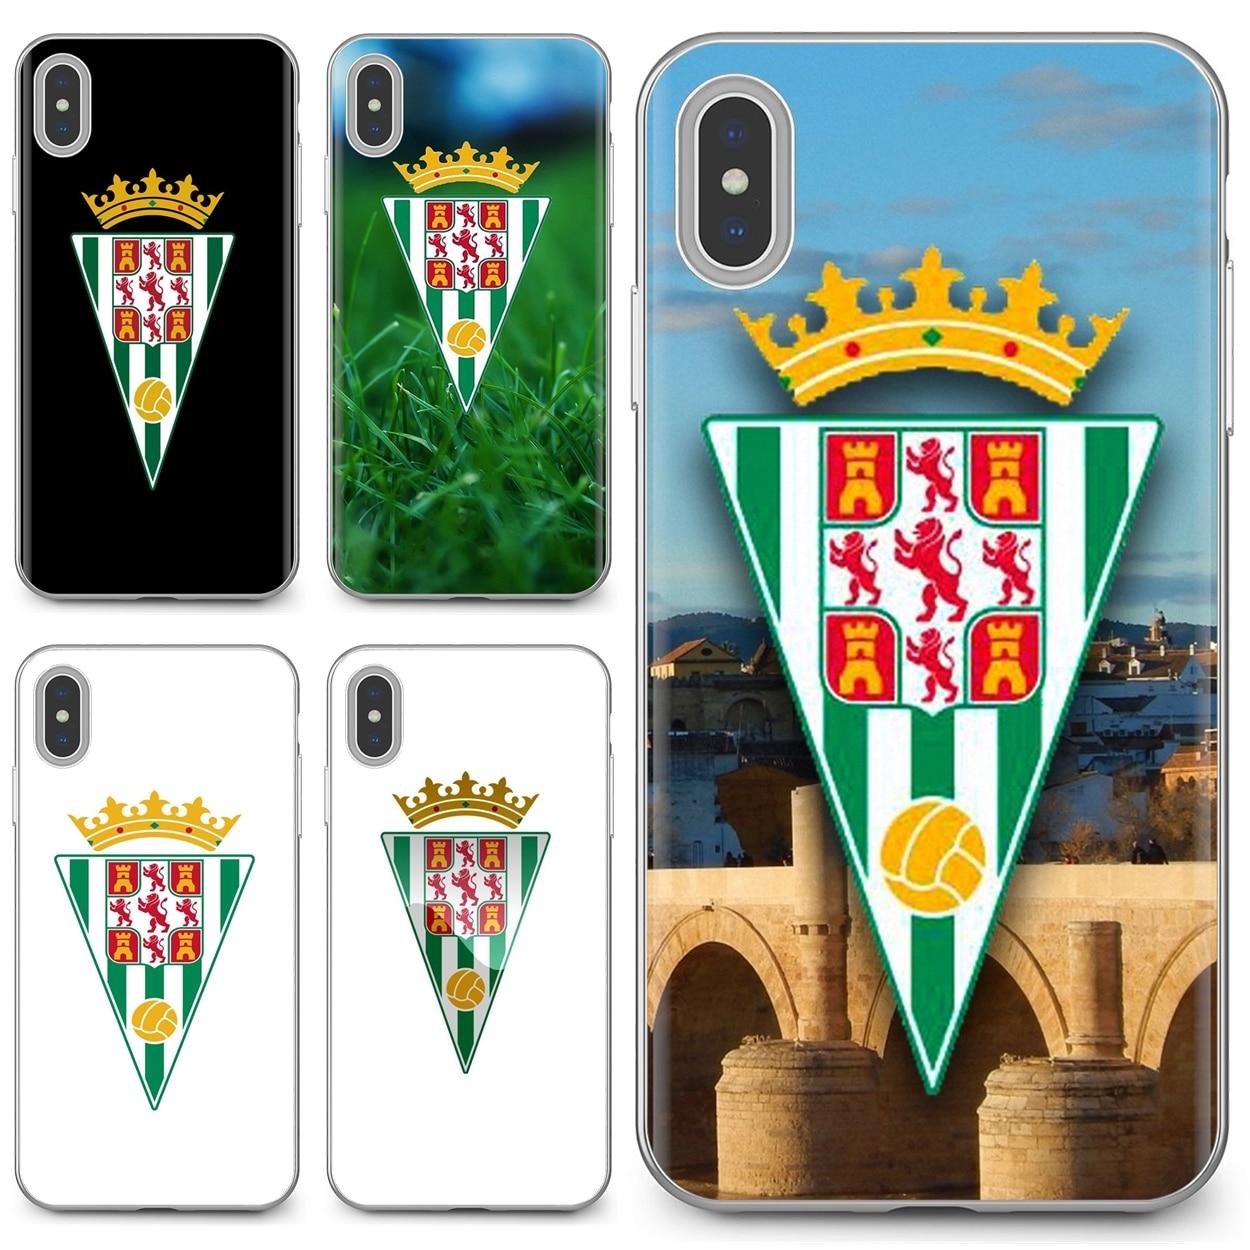 Buy Silicone Phone Case For Xiaomi Redmi 4A 7A S2 Note 8 3 3S 4 4X 5 Plus 6 7 6A Pro Pocophone F1 cordoba cf logo Spain Football(China)